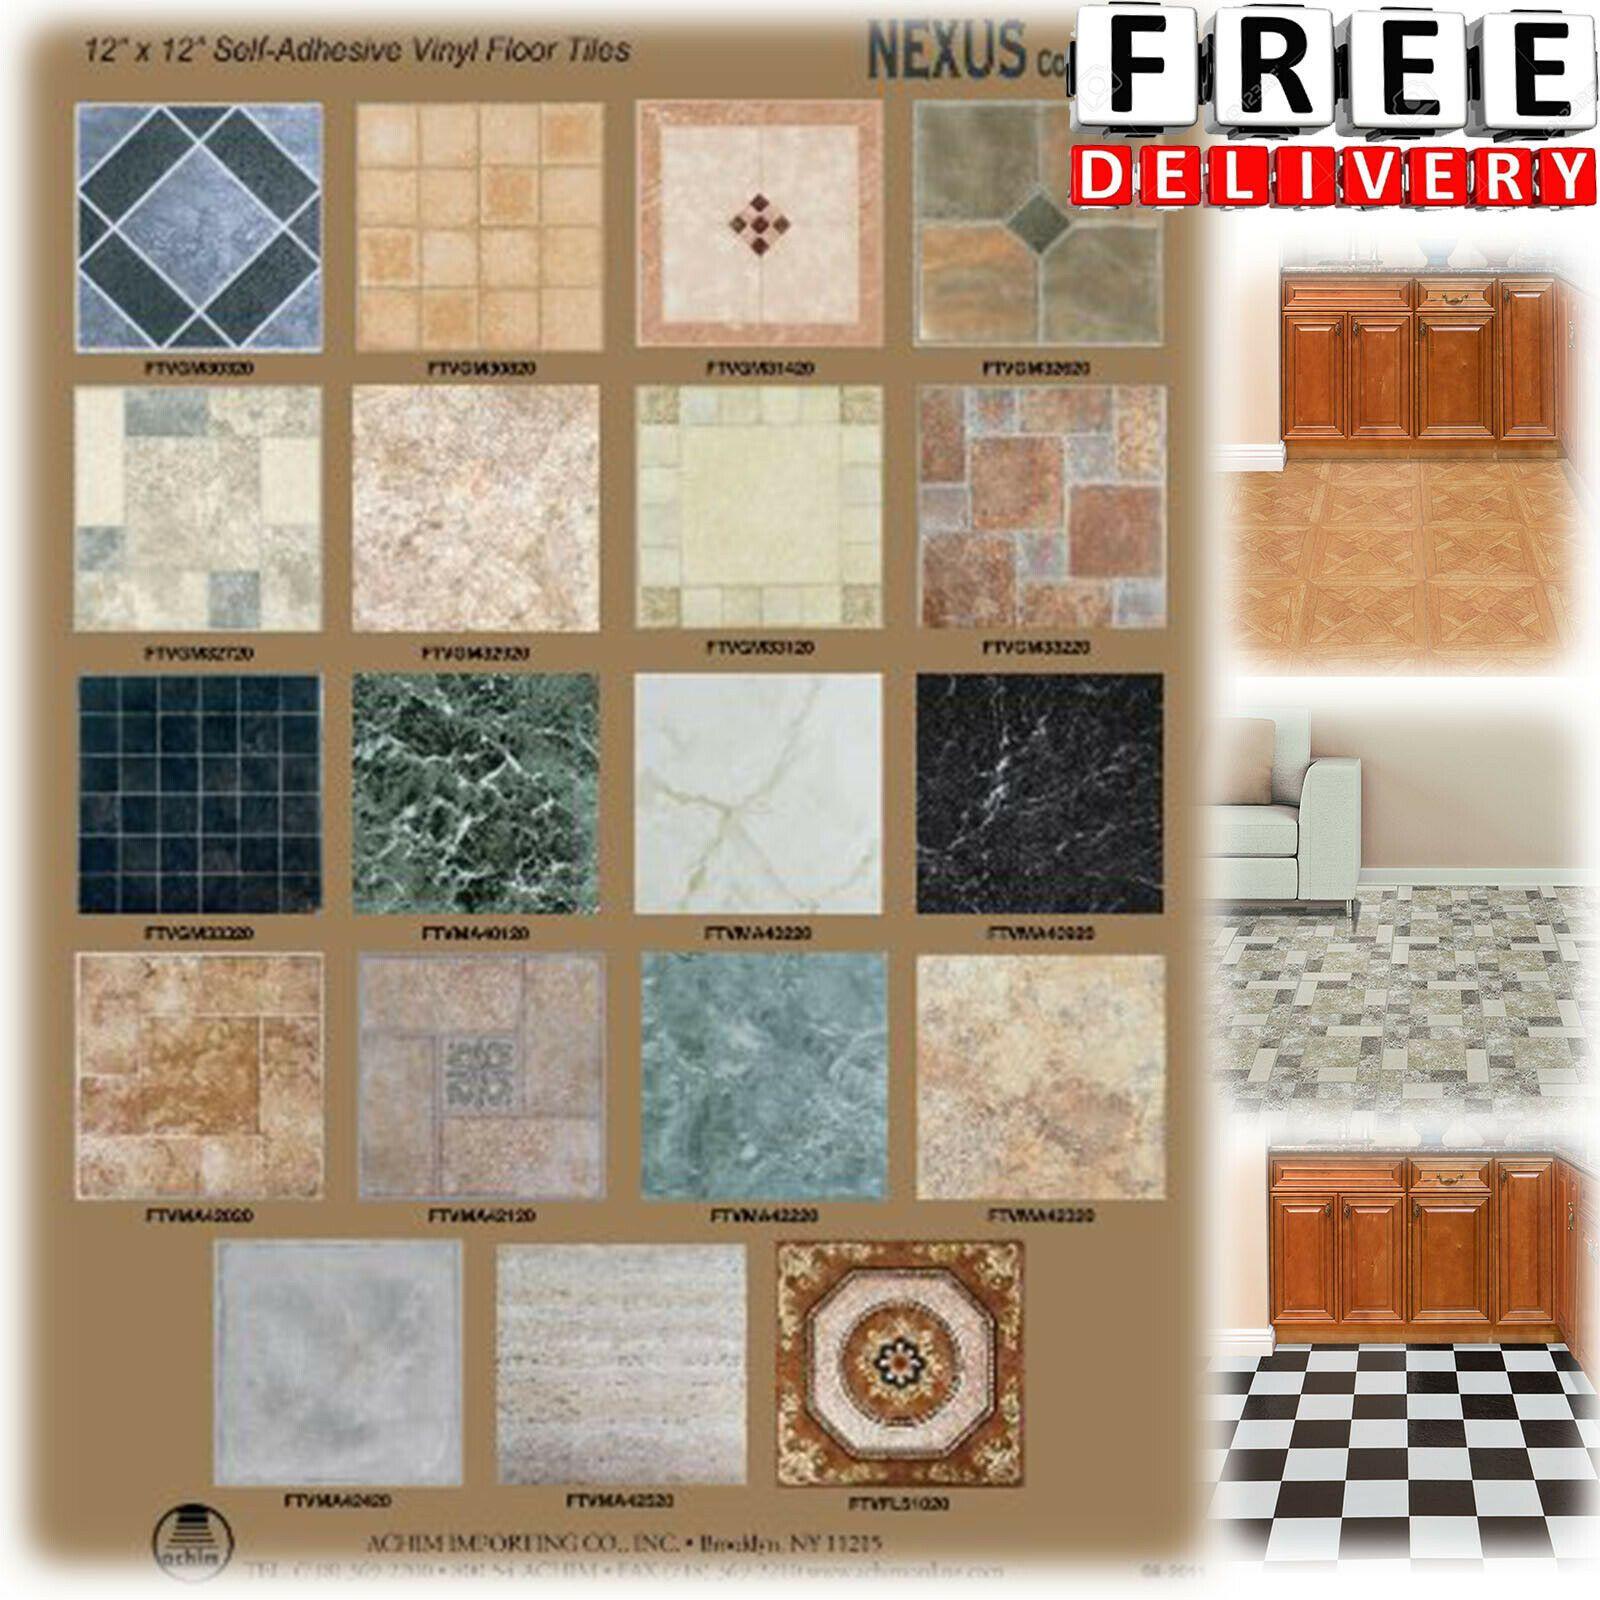 Vinyl Floor Tile Self Adhesive 12x12 20 Pack Kitchen Bathroom